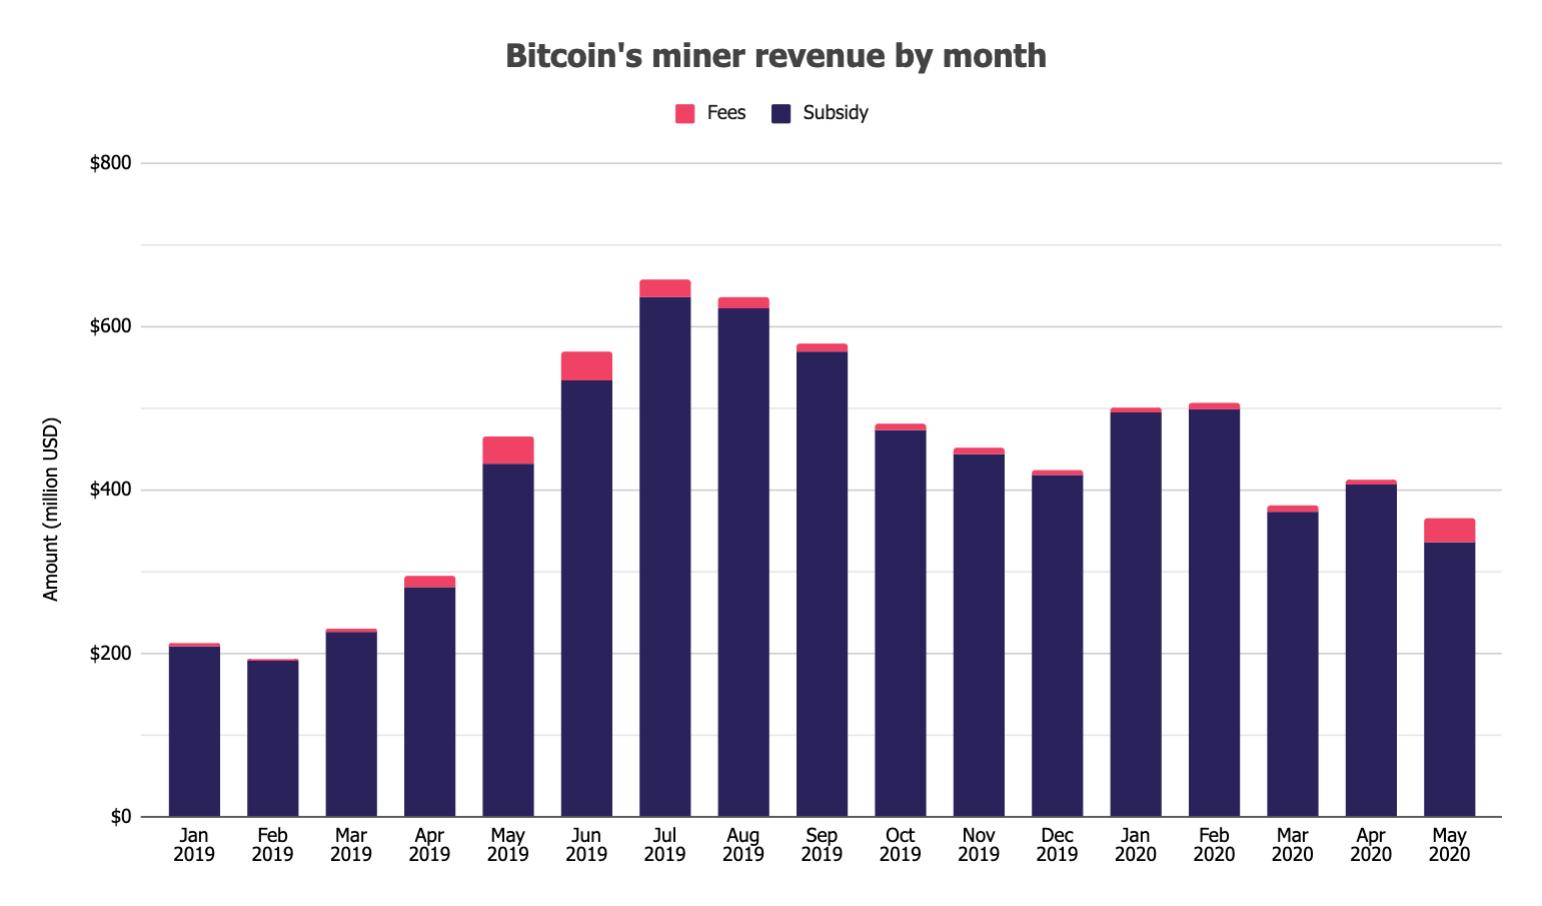 1 b iac6j0pvs0jejd0l ldg - В мае биткоин-майнеры заработали более $366 млн